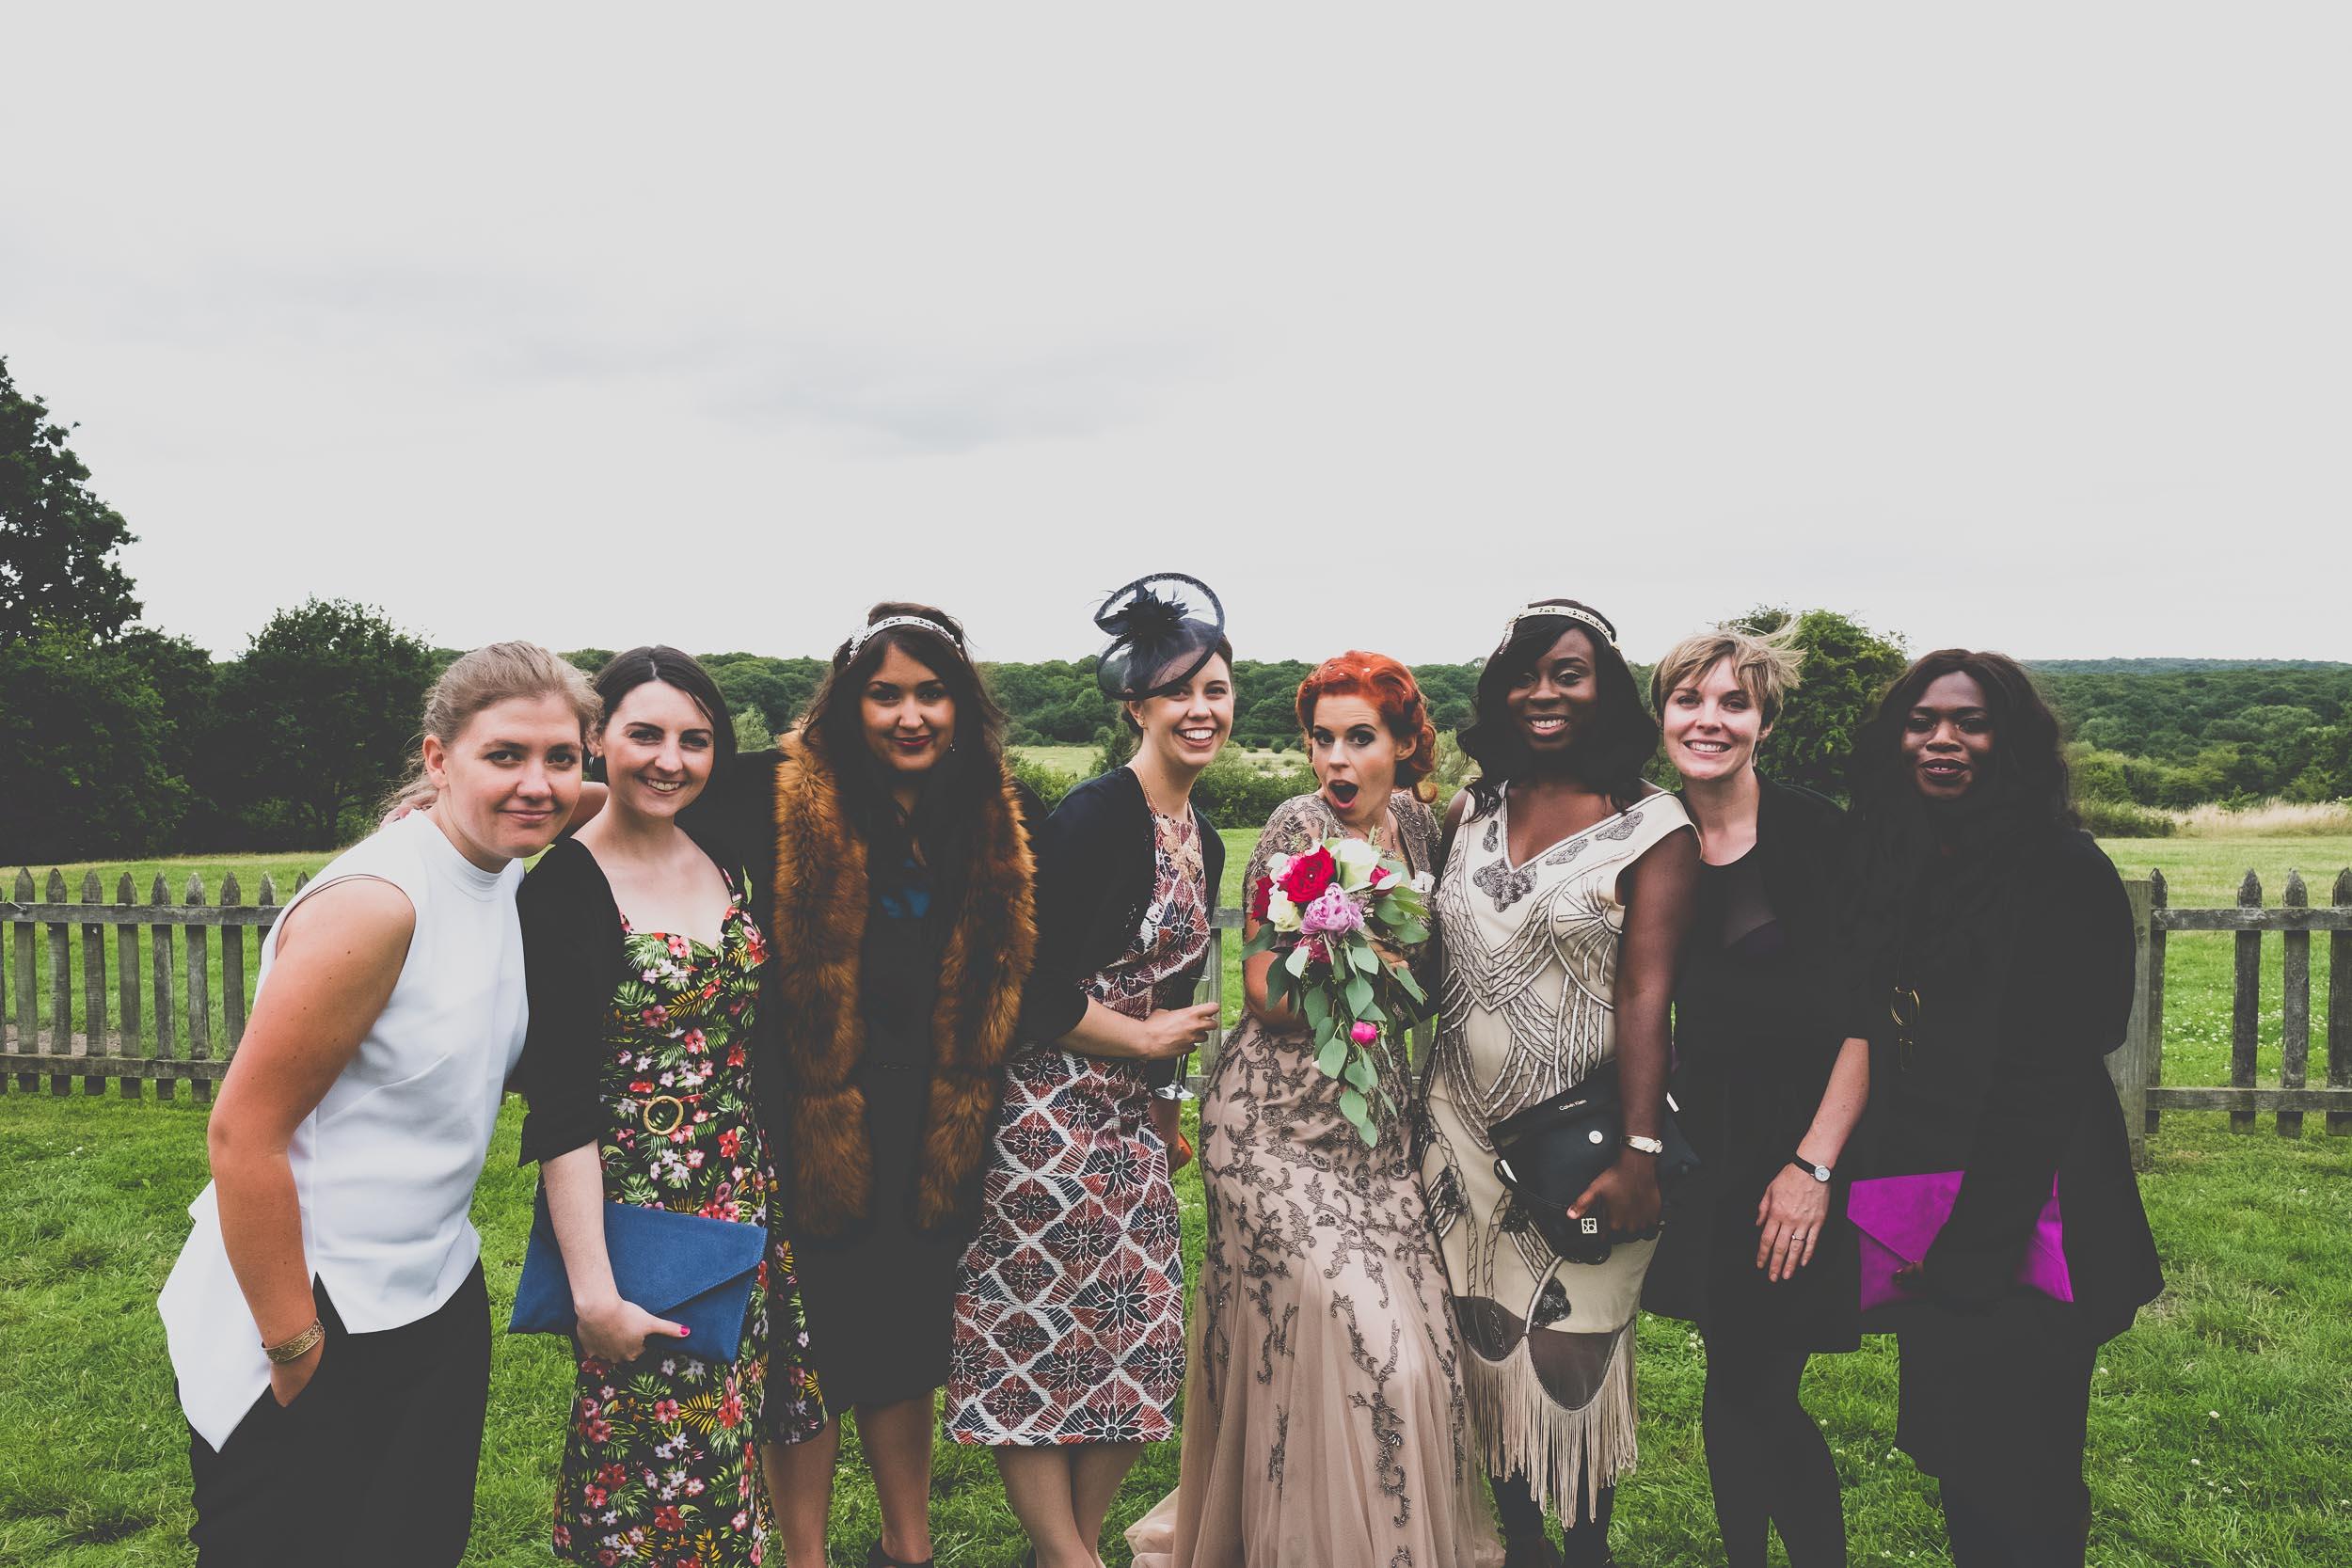 queen-elizabeths-hunting-lodge-epping-forest-wedding240.jpg